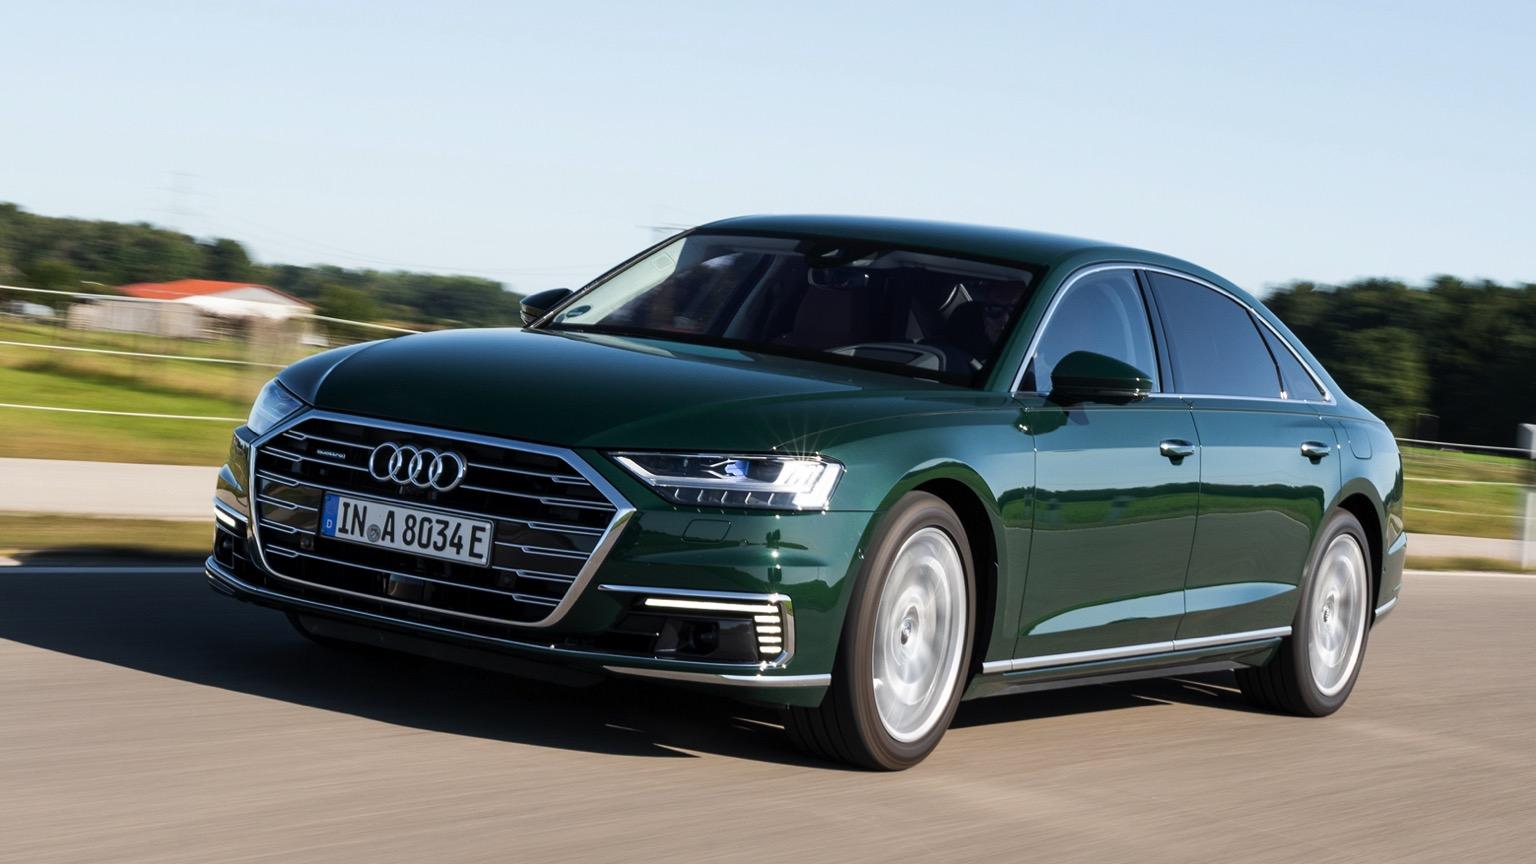 Audi A8 L 60 TFSI e quattro (2019)